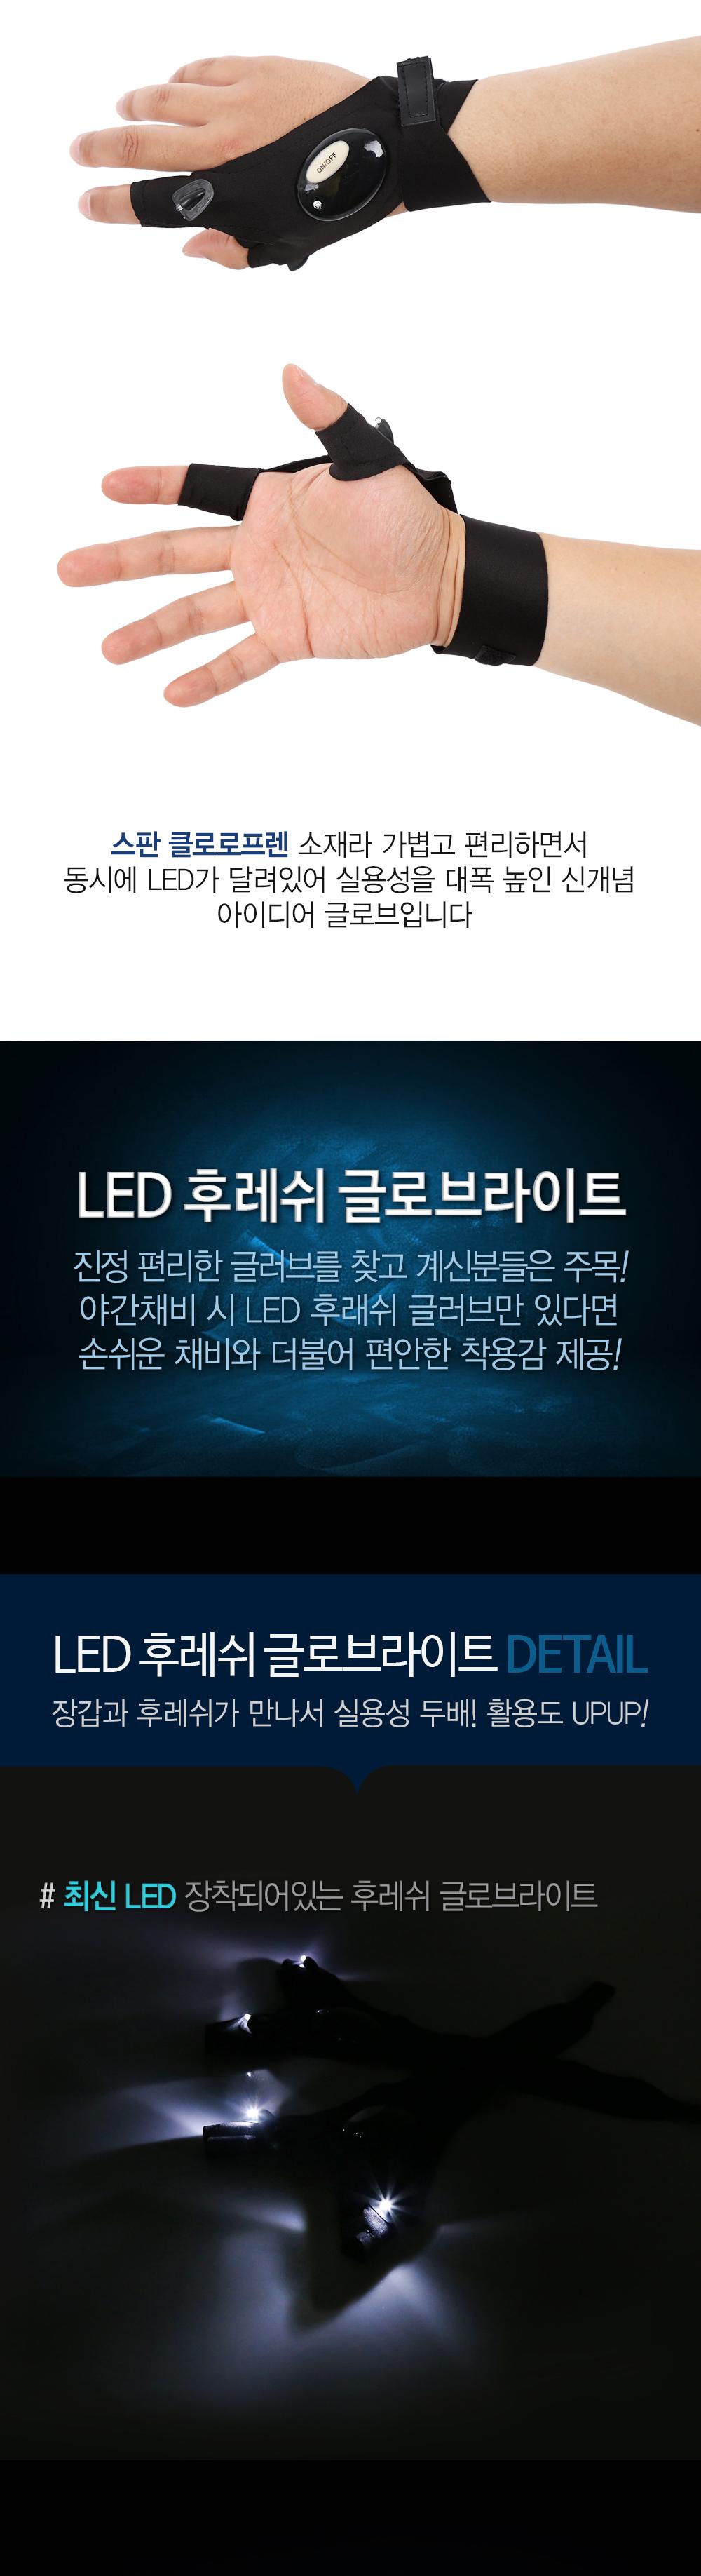 KLF LED 후레쉬 글로브라이트 캡라이트 라이트 휴대용 장갑 아이디어 글러브 낚시장갑